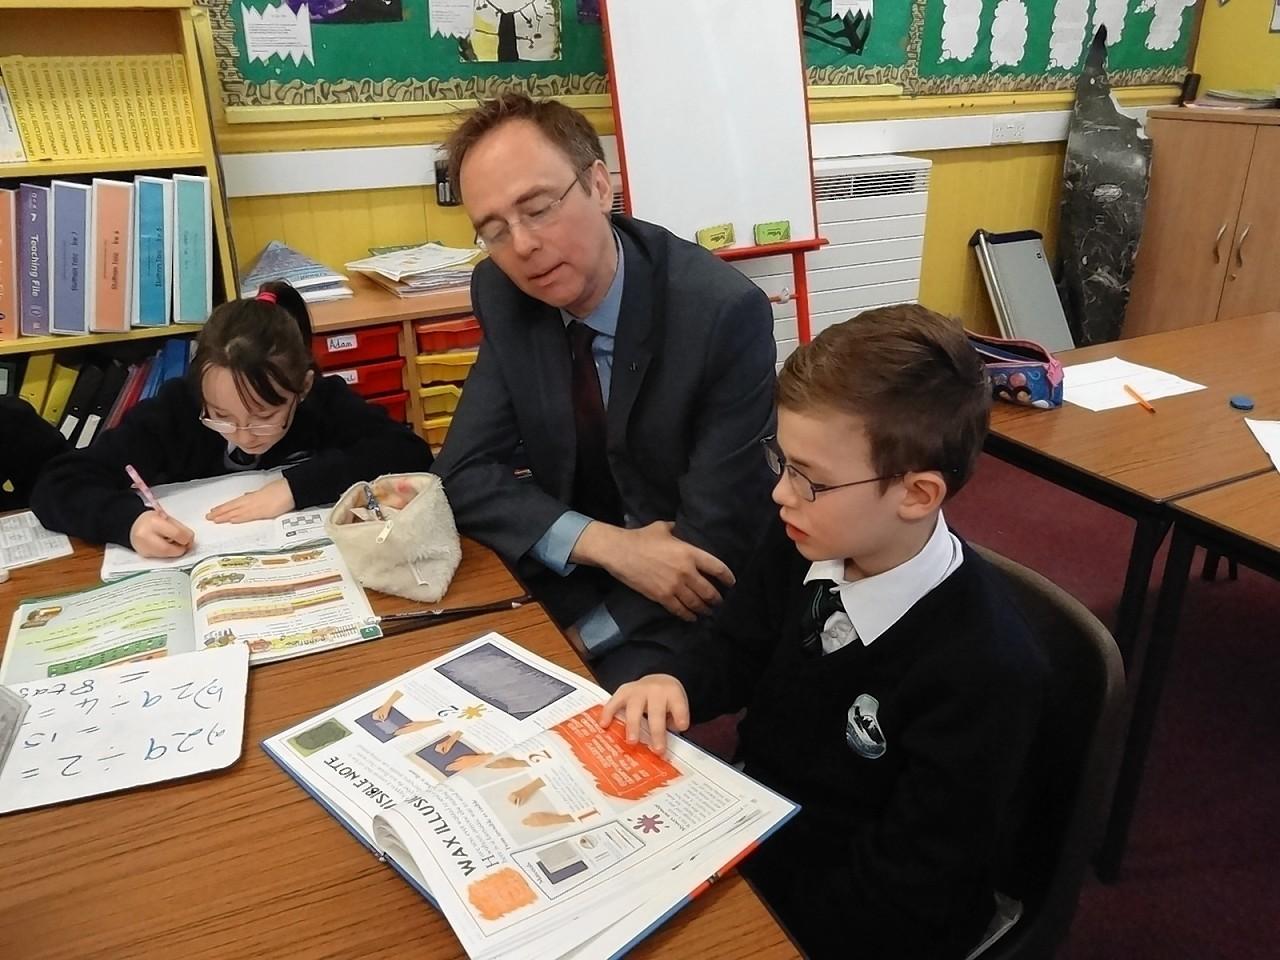 Gaelic Minister and Isles MSP, Alasdair Allan visited Breasclete School